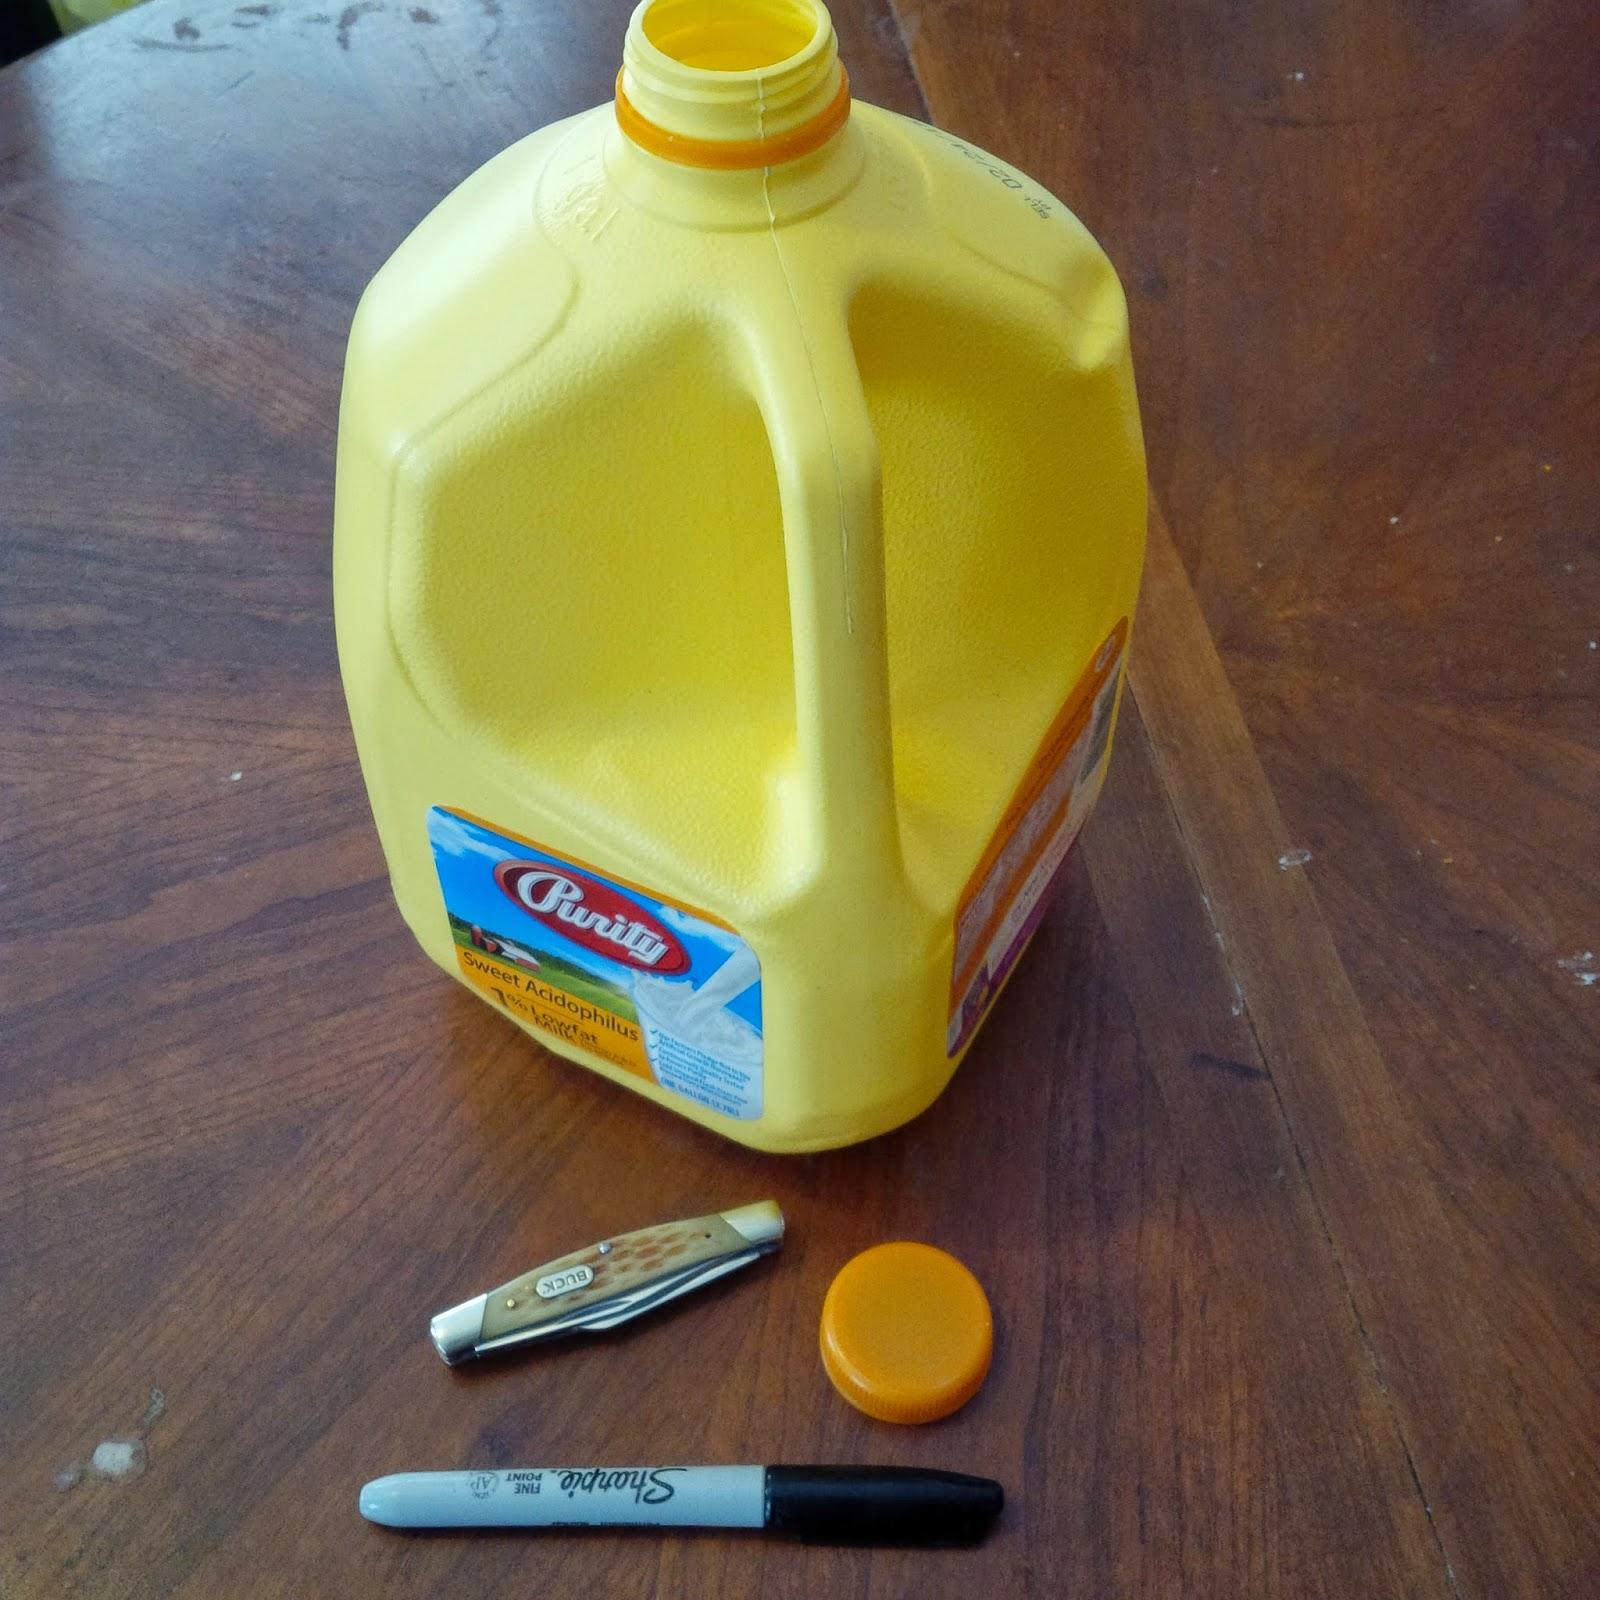 milk jug, marker, milk jug lid, knife